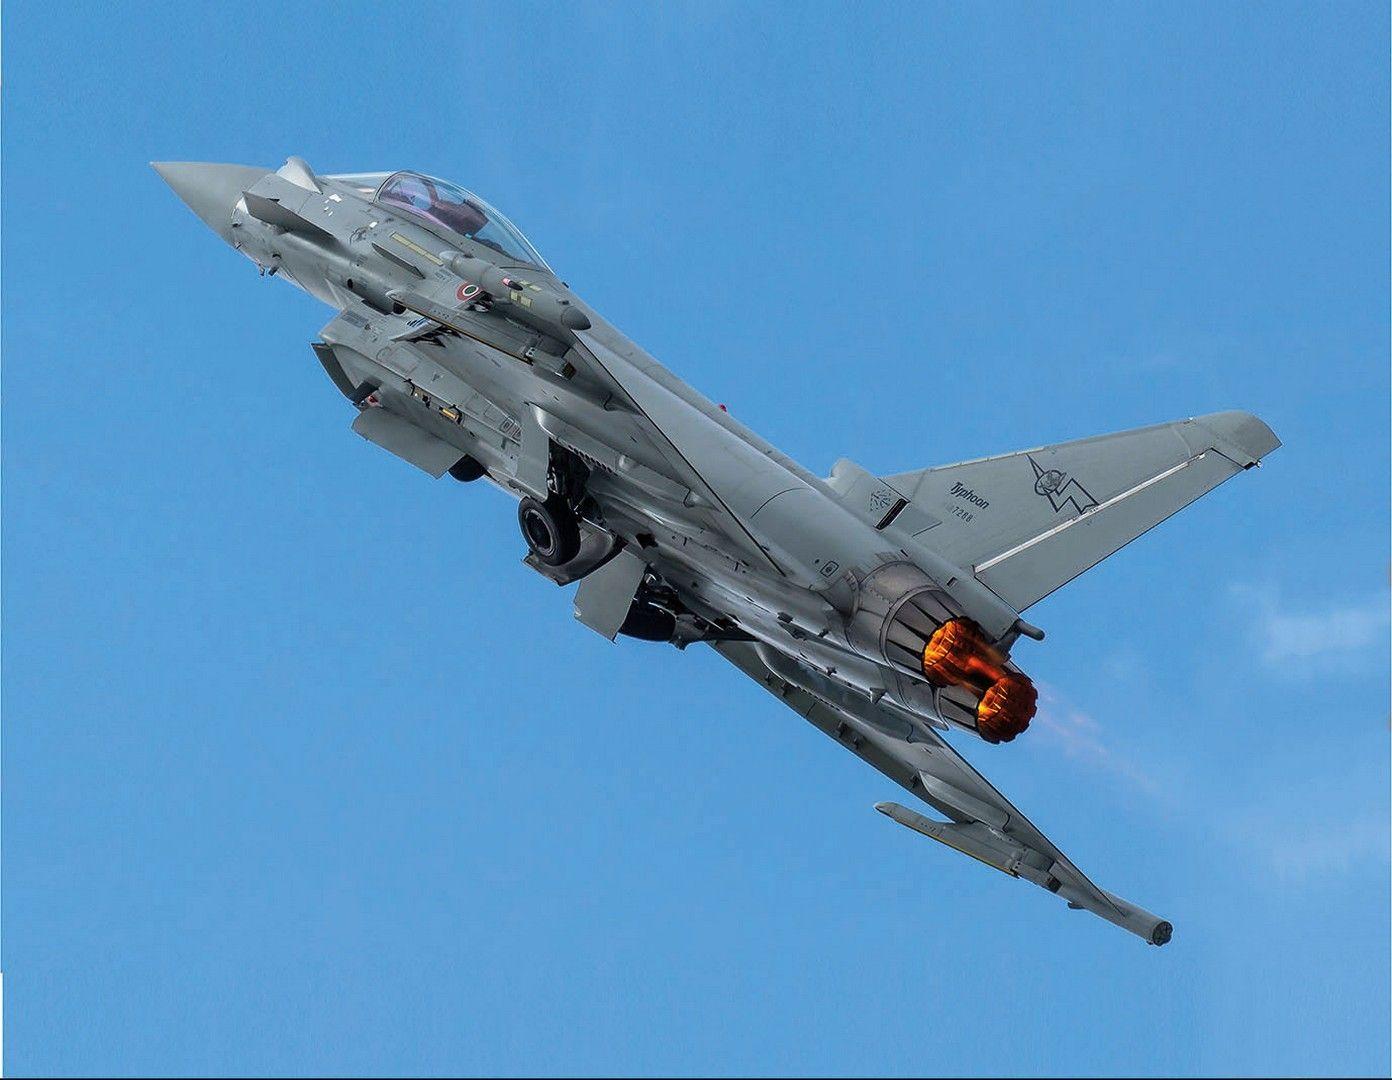 Обои самолеты, Eurofighter typhoon. Авиация foto 13